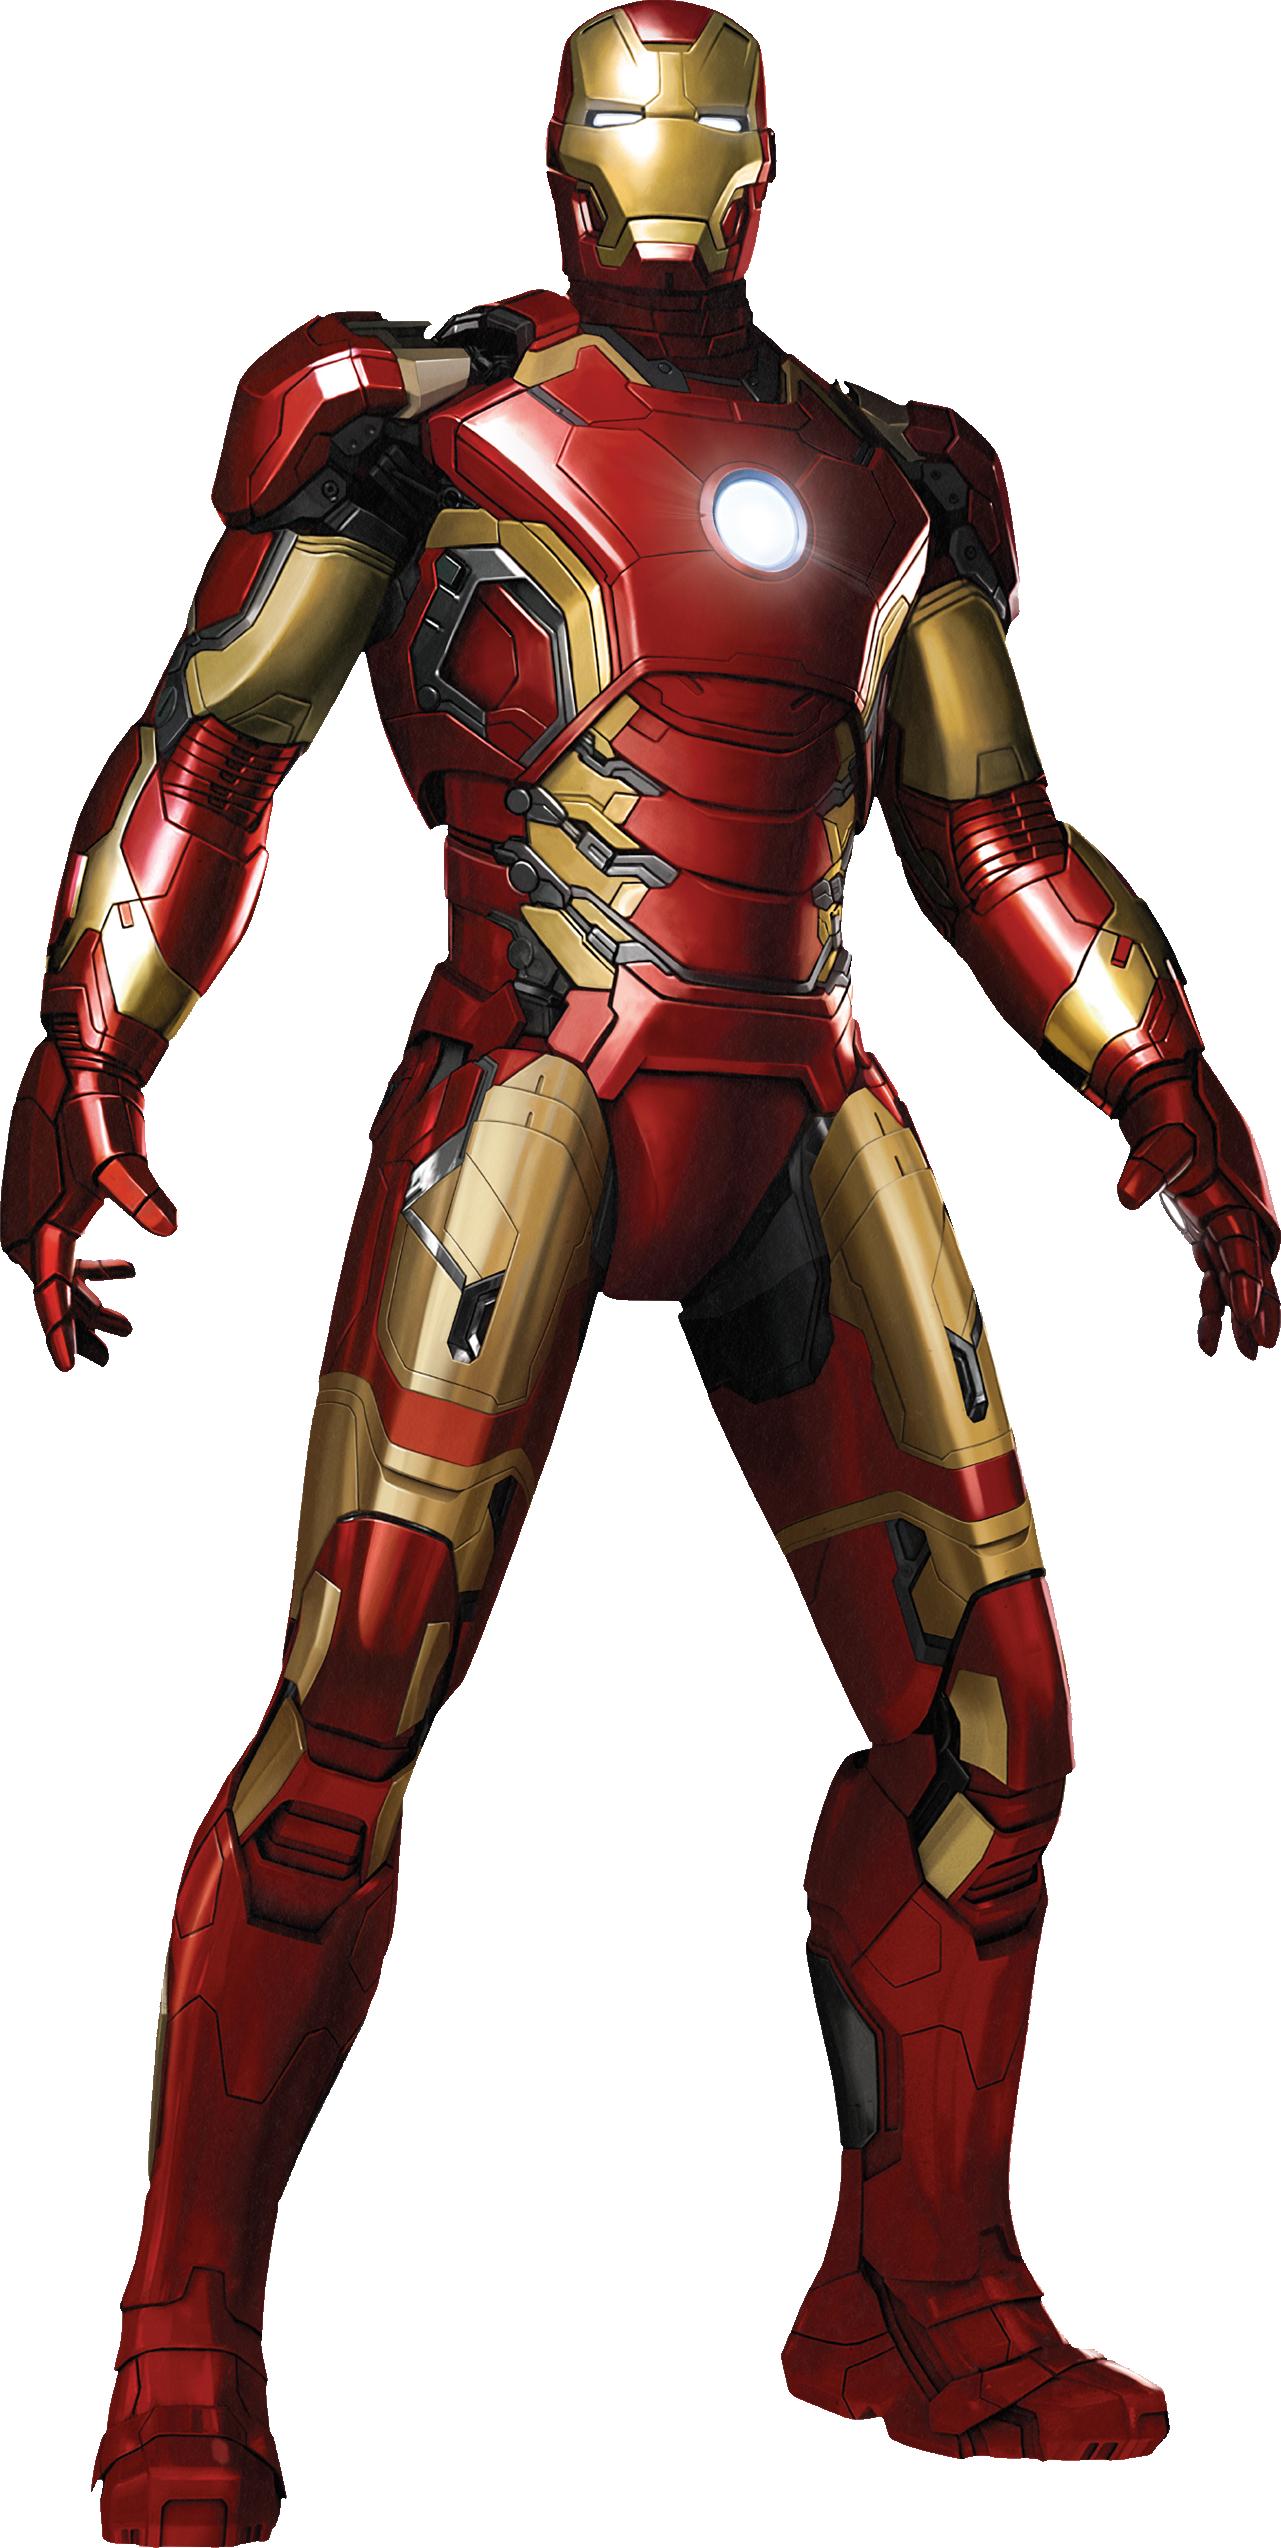 Iron man marvel cinematic universe vs battles wiki - Iron man 1 images ...